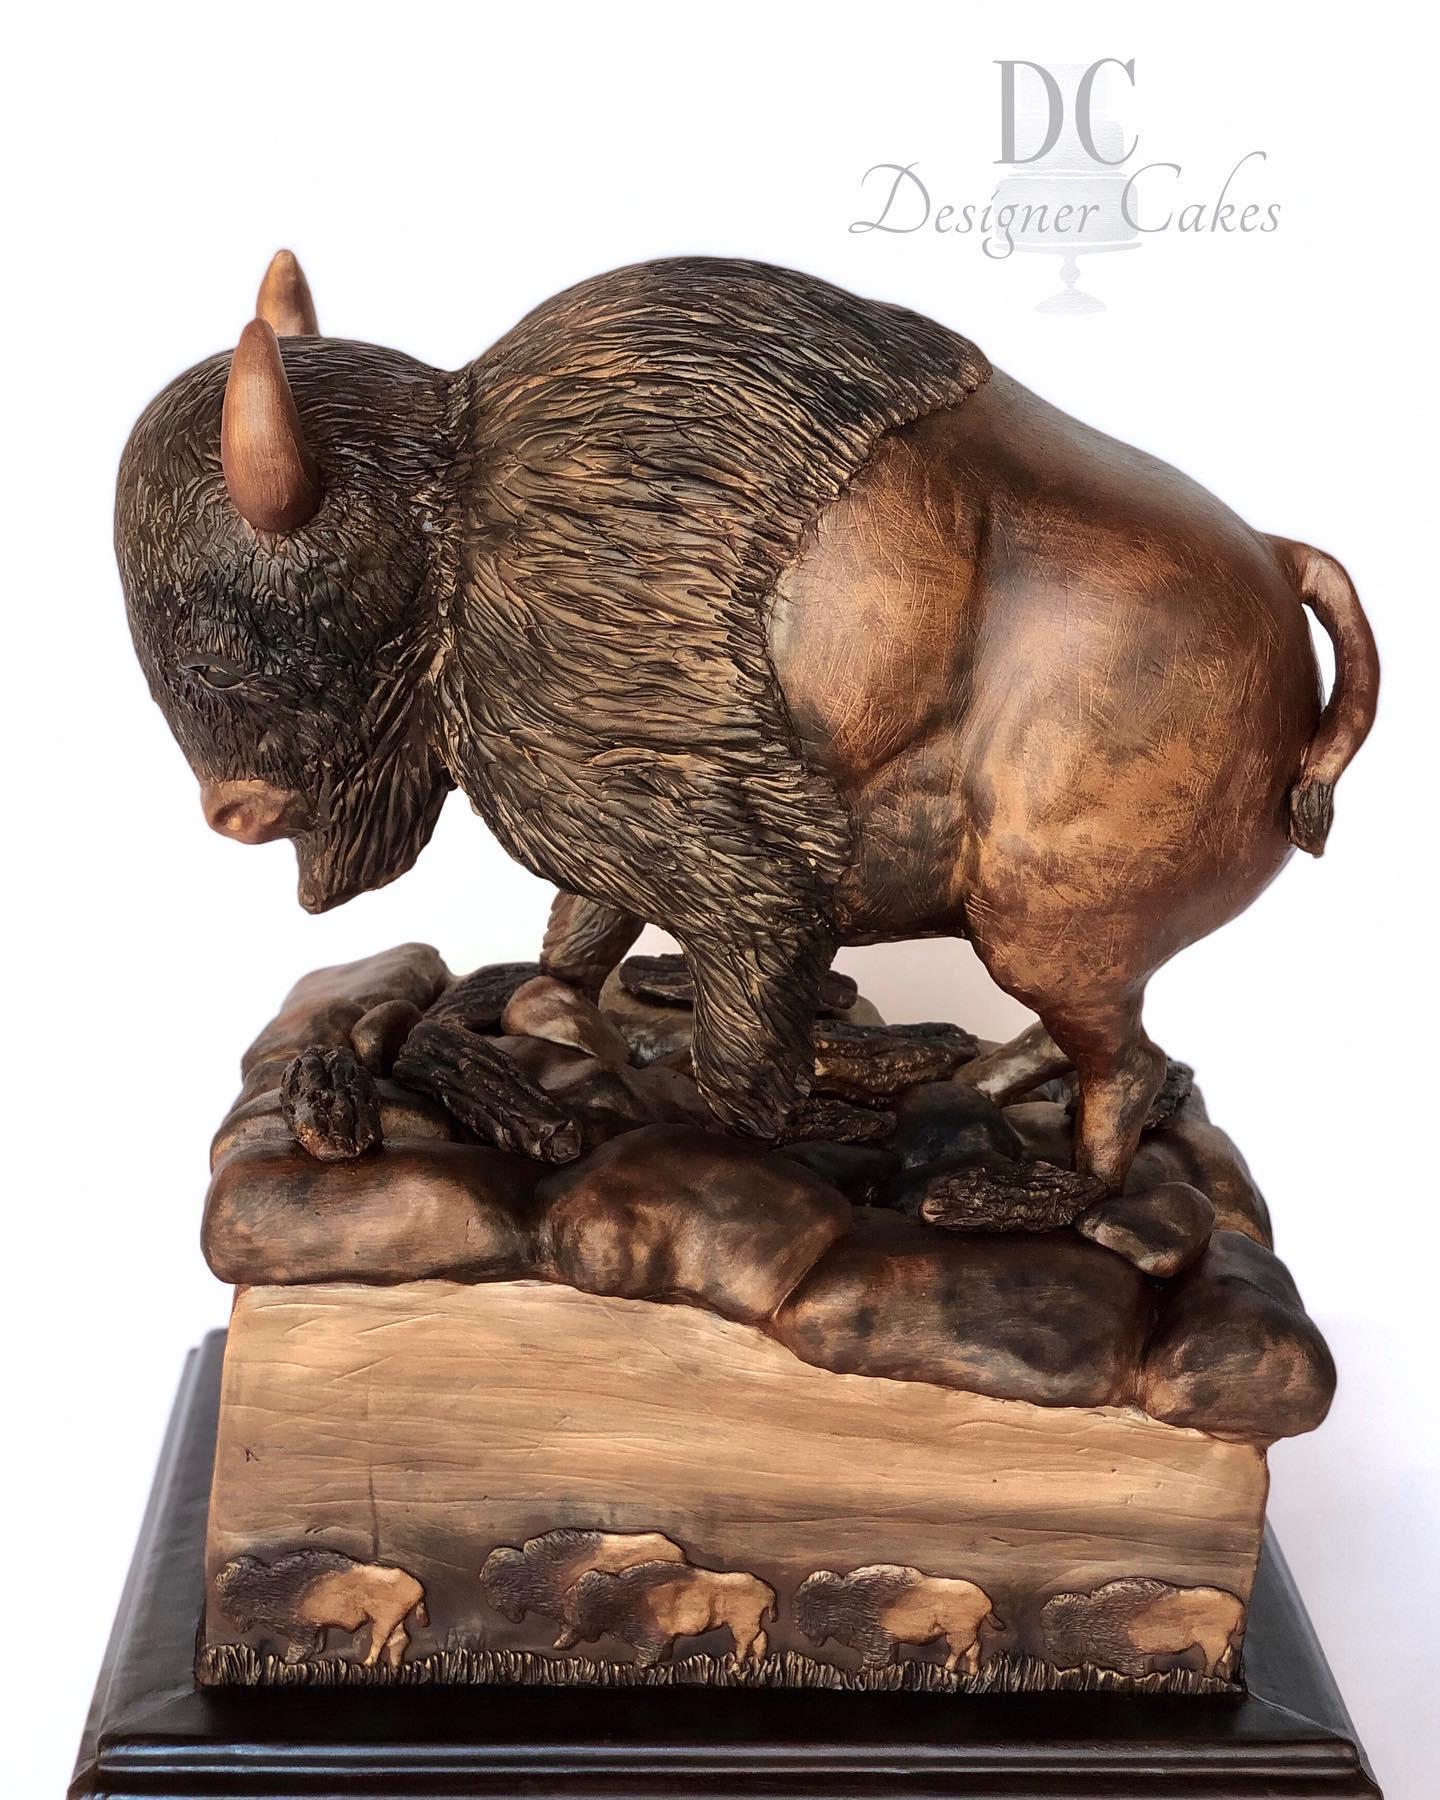 Sculpted Buffalo Cake